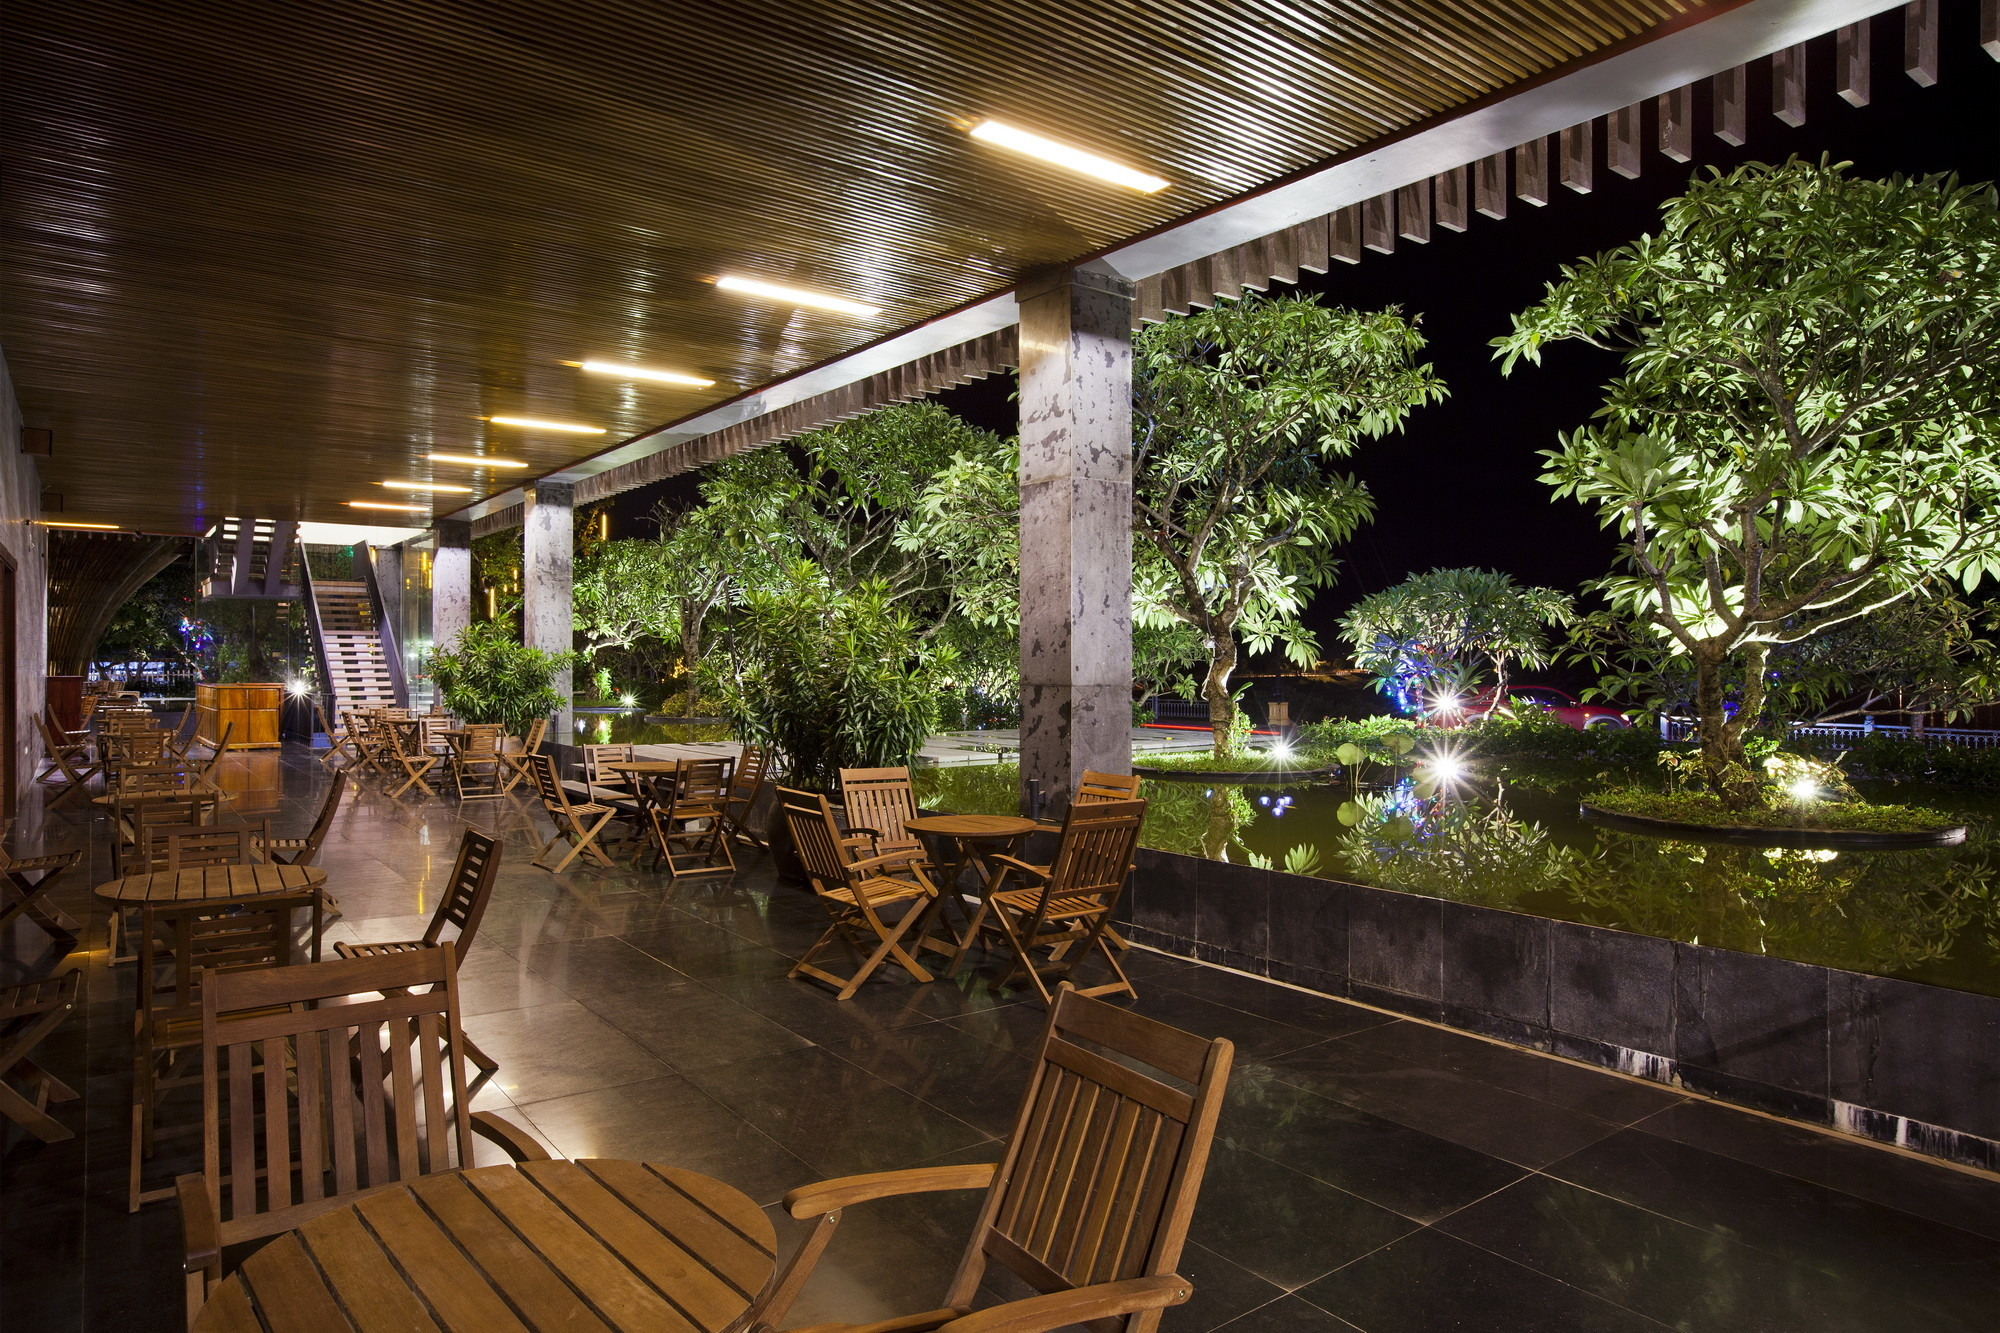 Gallery of Kontum Indochine Wedding Hall  VTN Architects  6